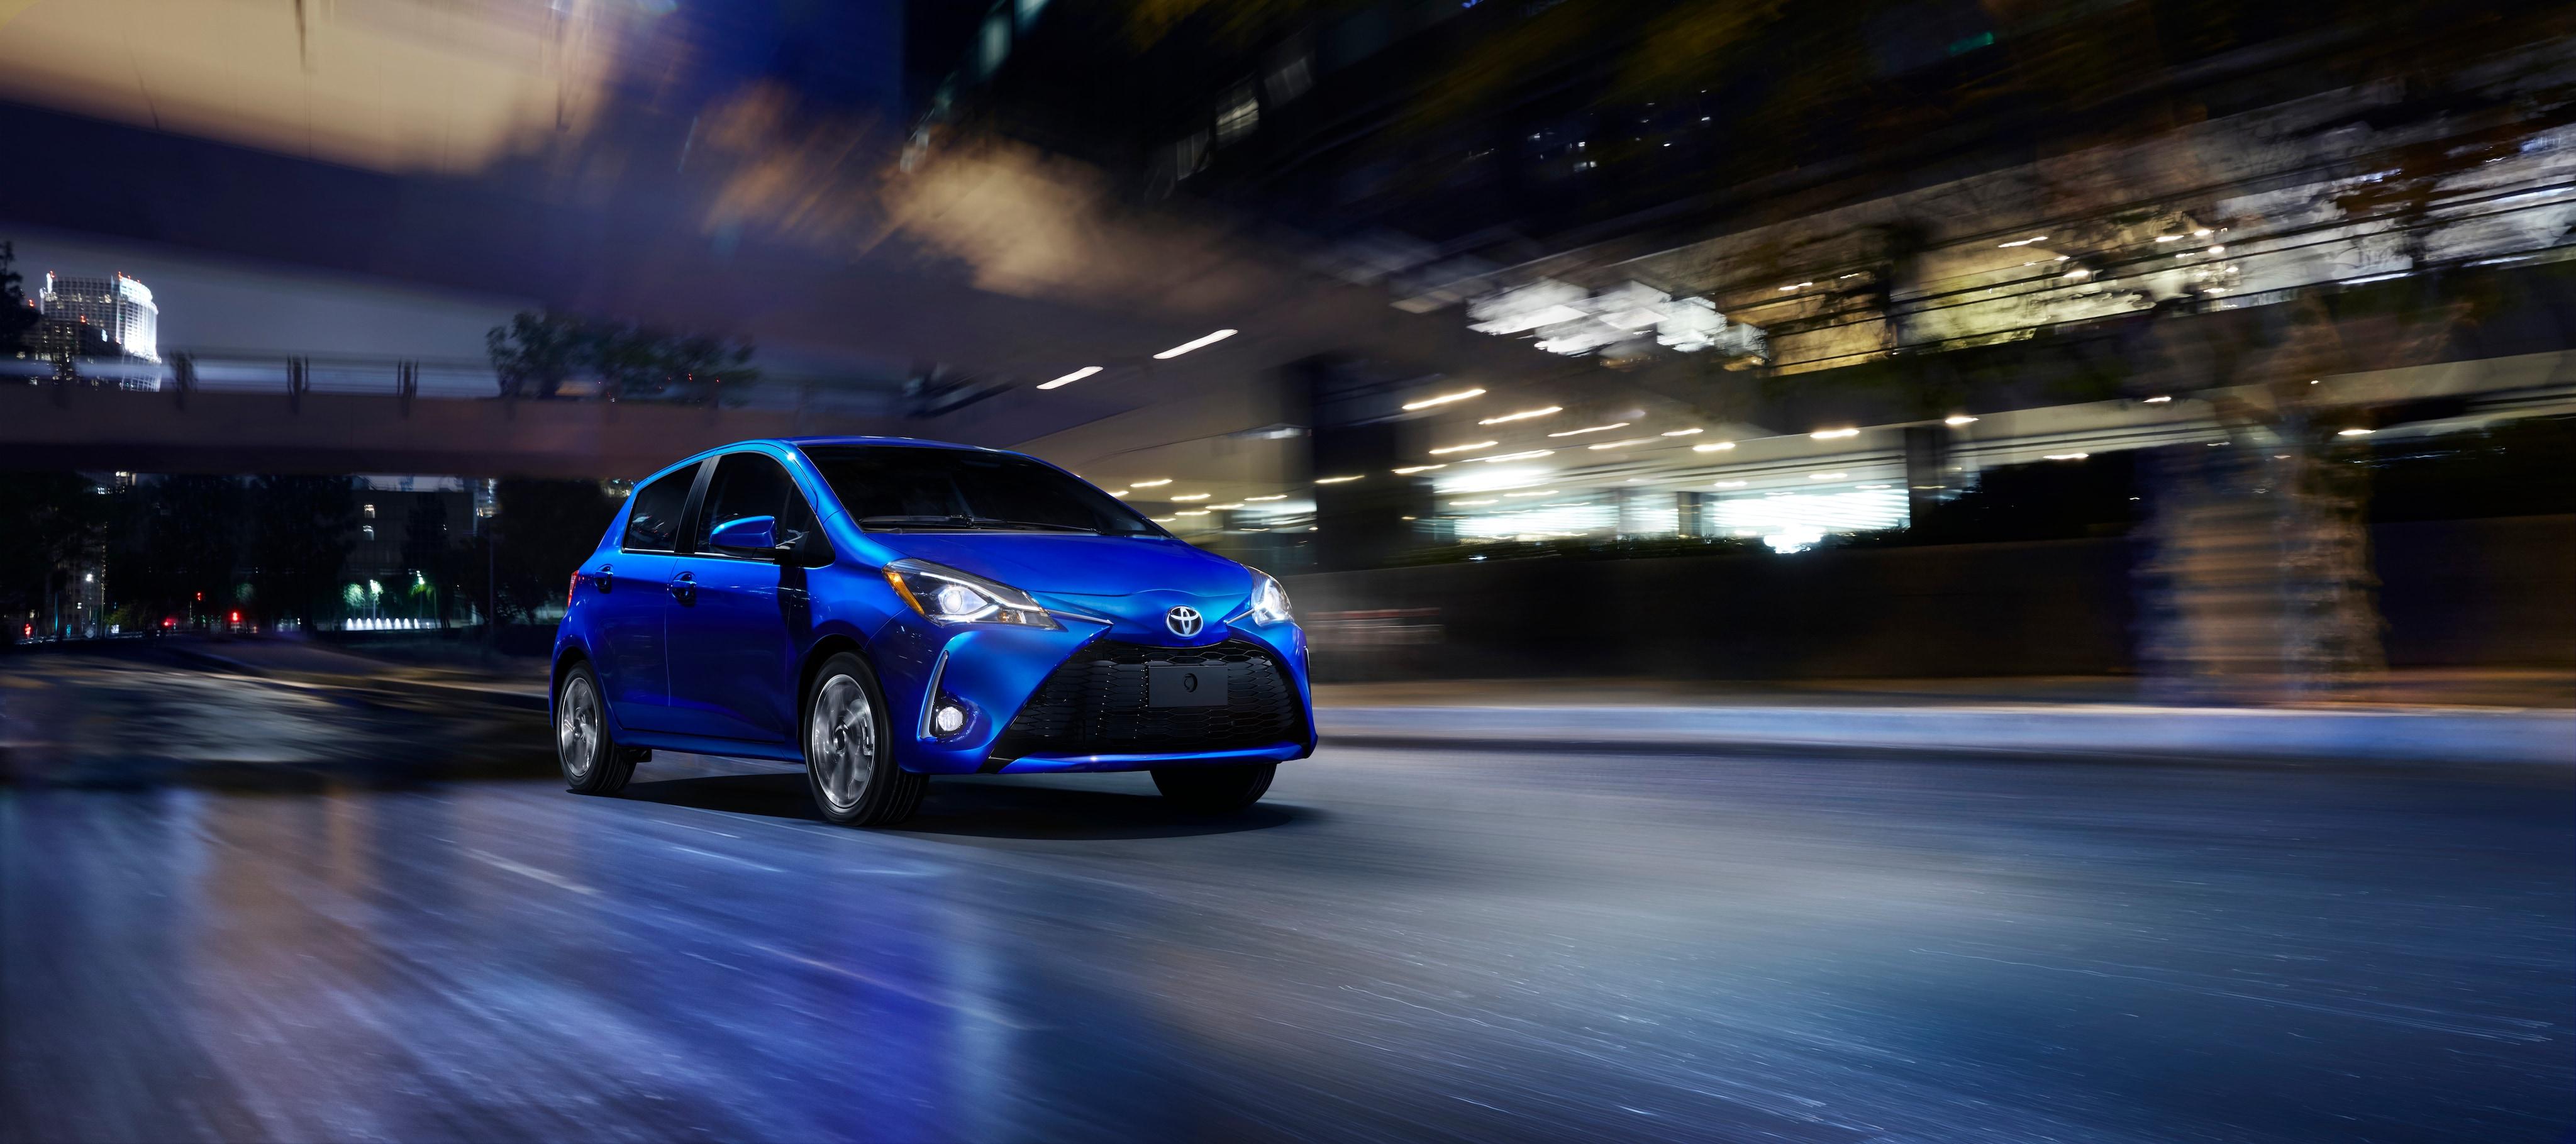 2018 Toyota Yaris in Little Rock AR